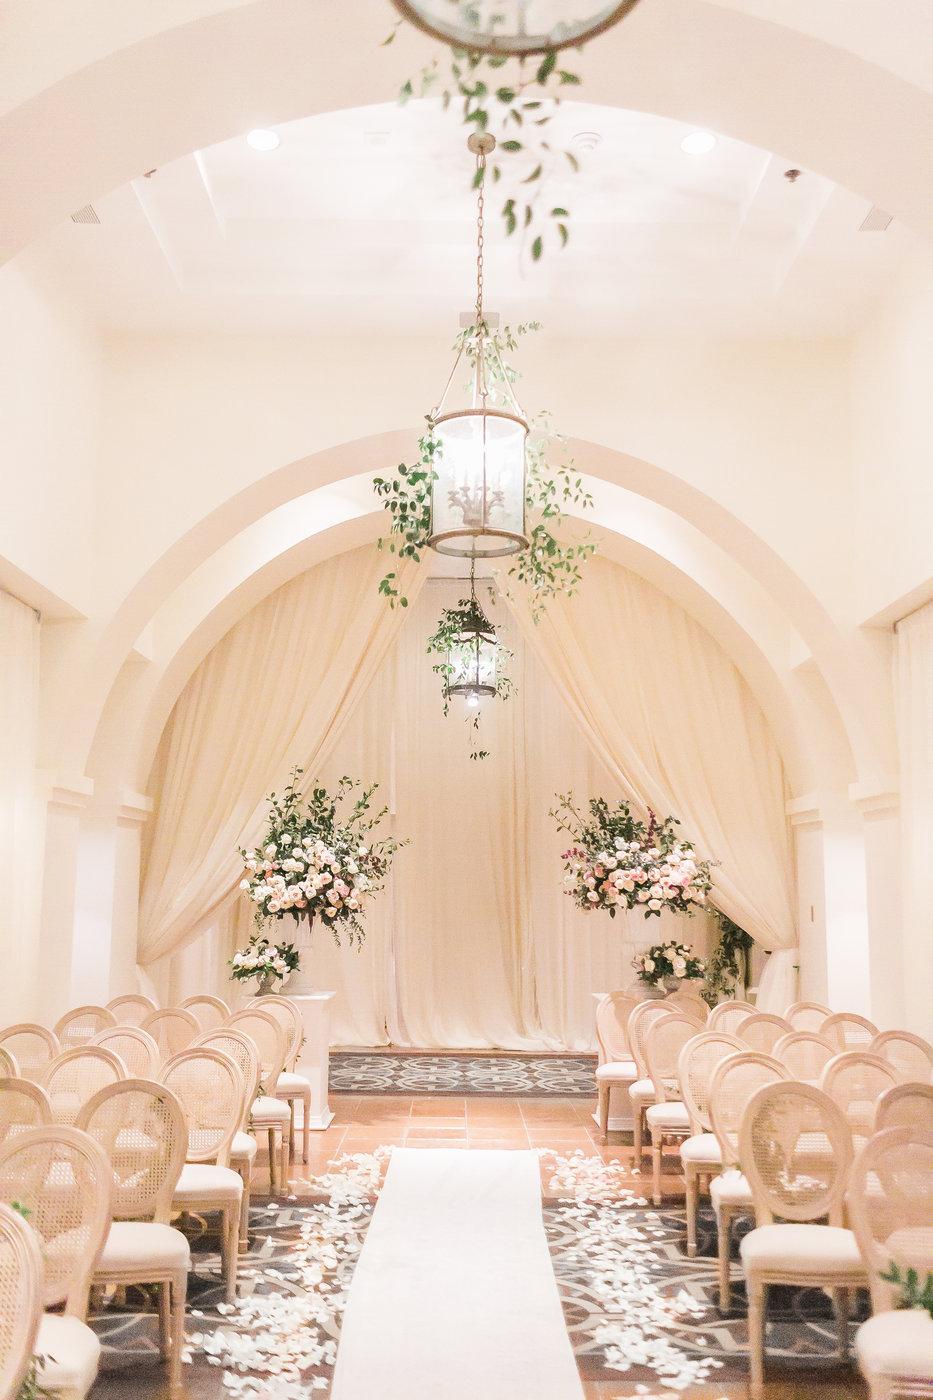 wedding ceremony floral and decor las vegas wedding planner.jpg